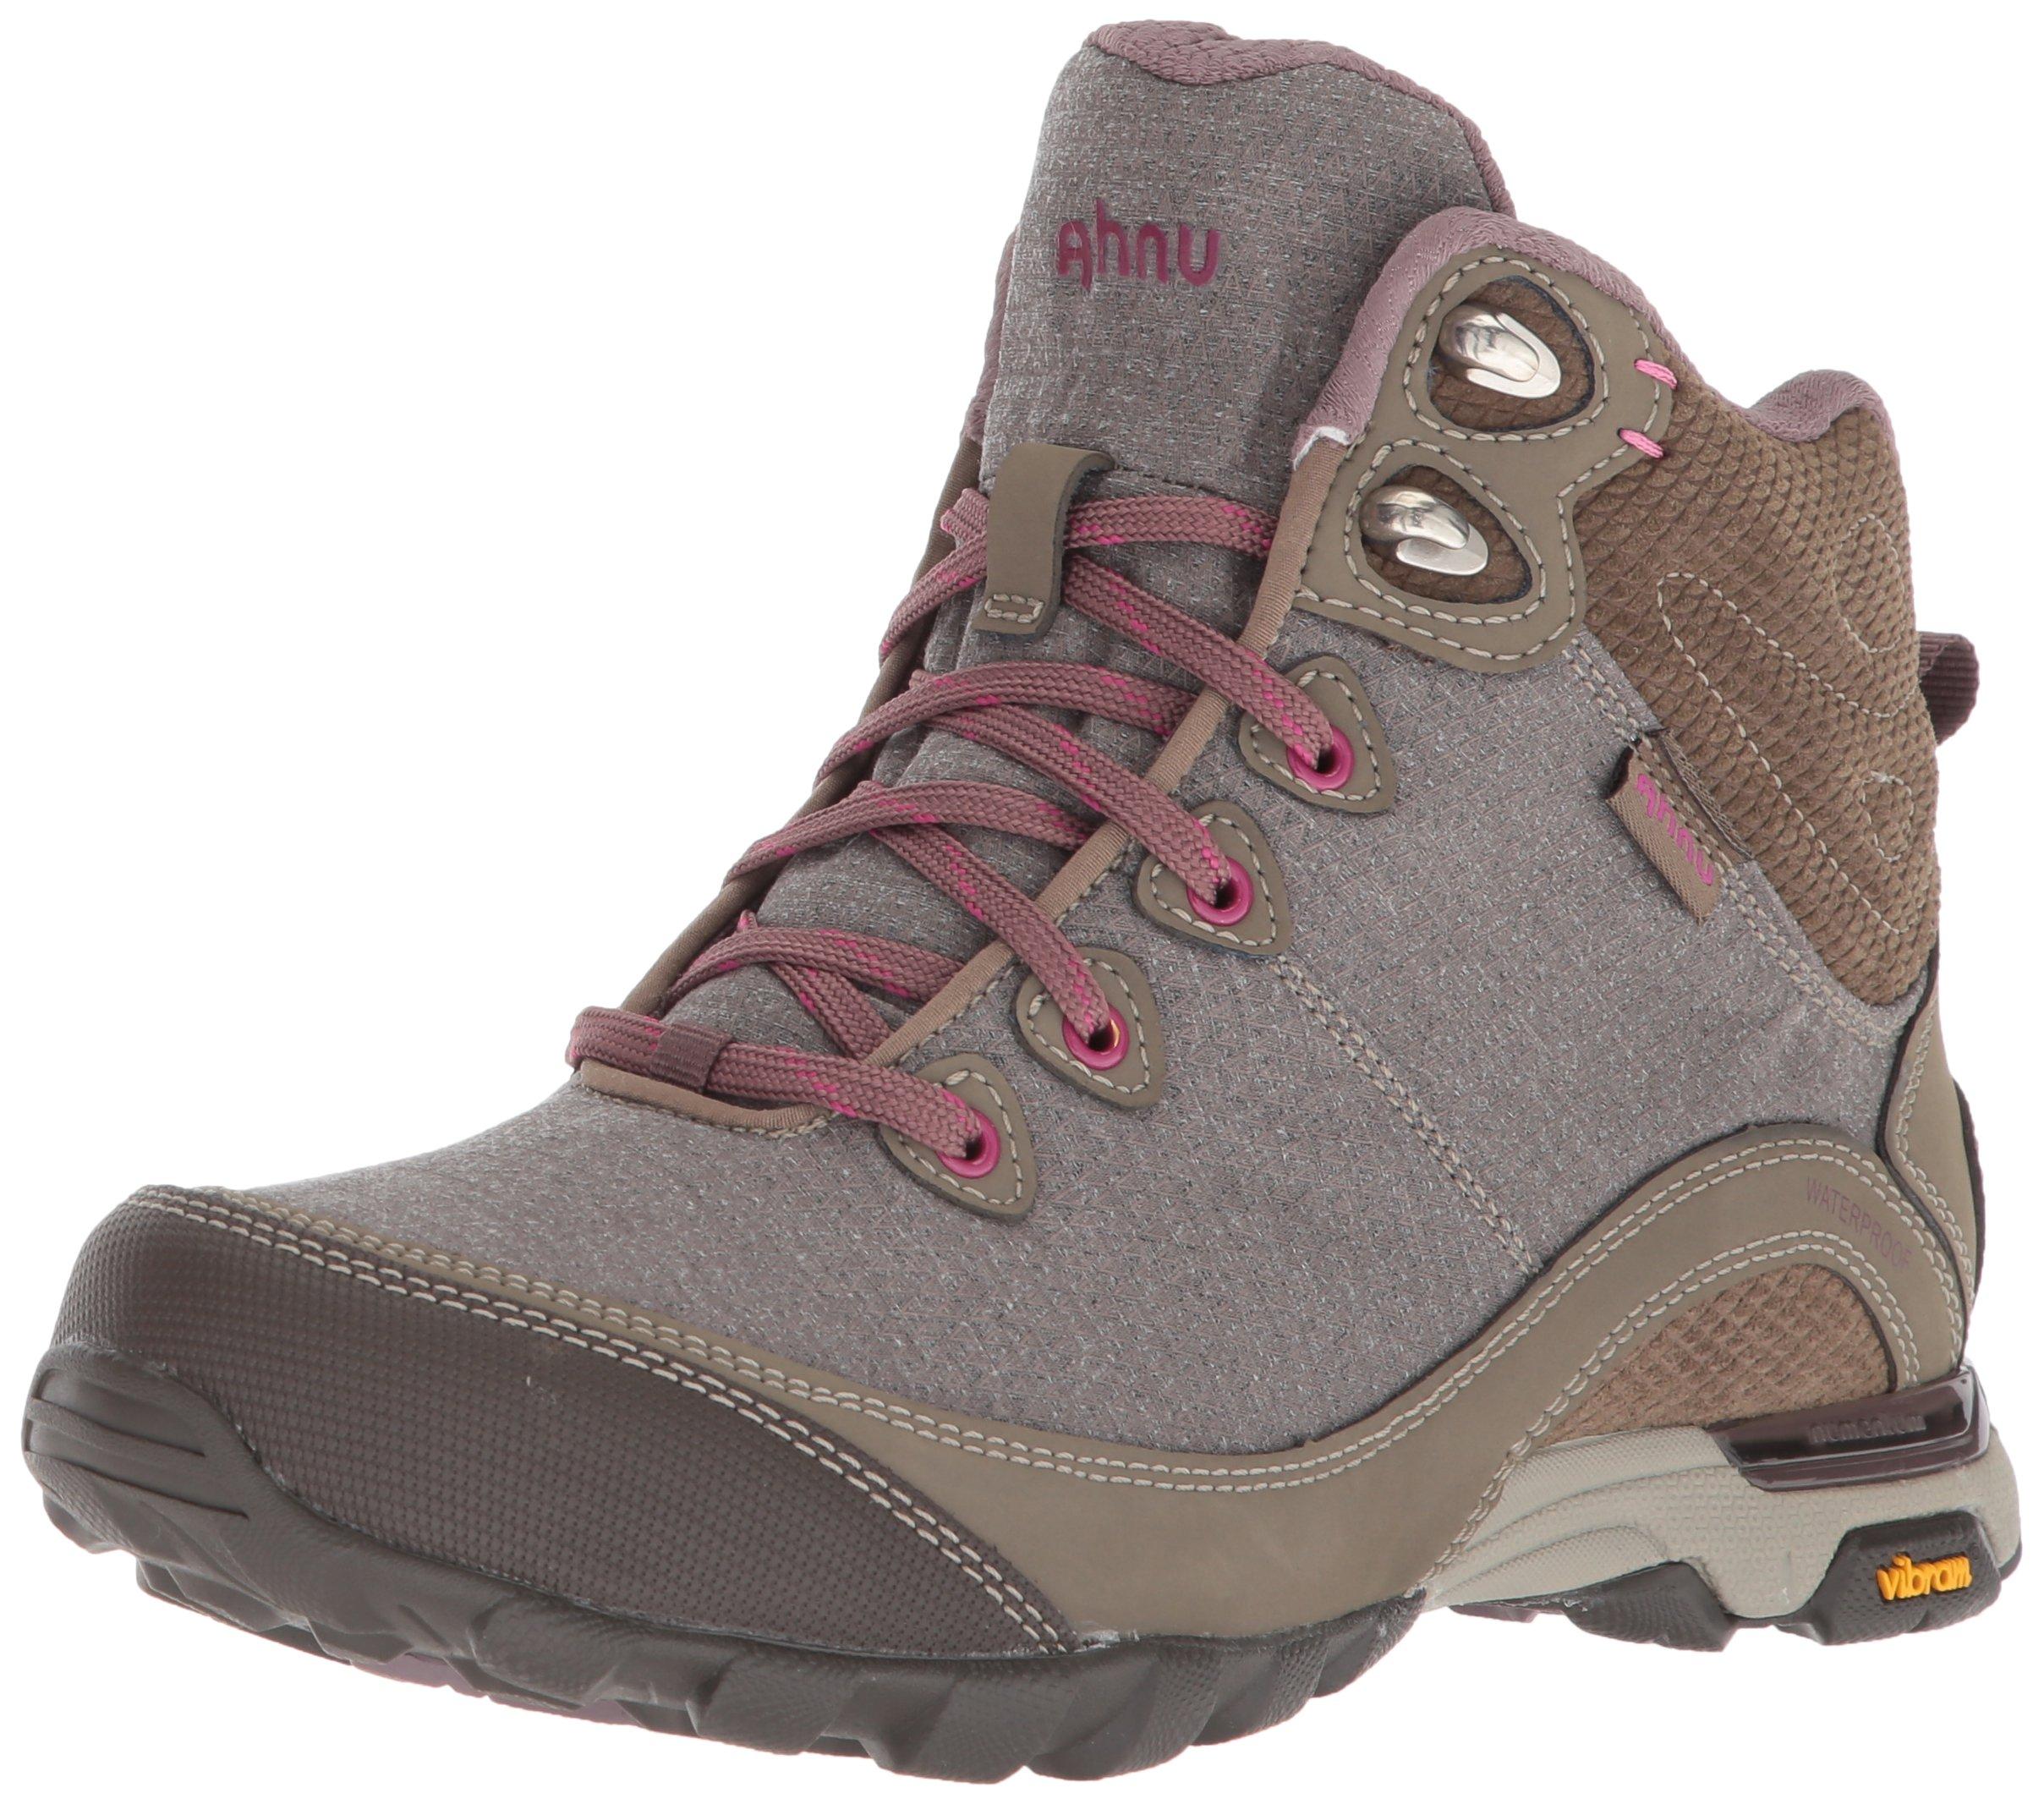 Ahnu Women's W Sugarpine II Waterproof Hiking Boot, Walnut, 6.5 Medium US